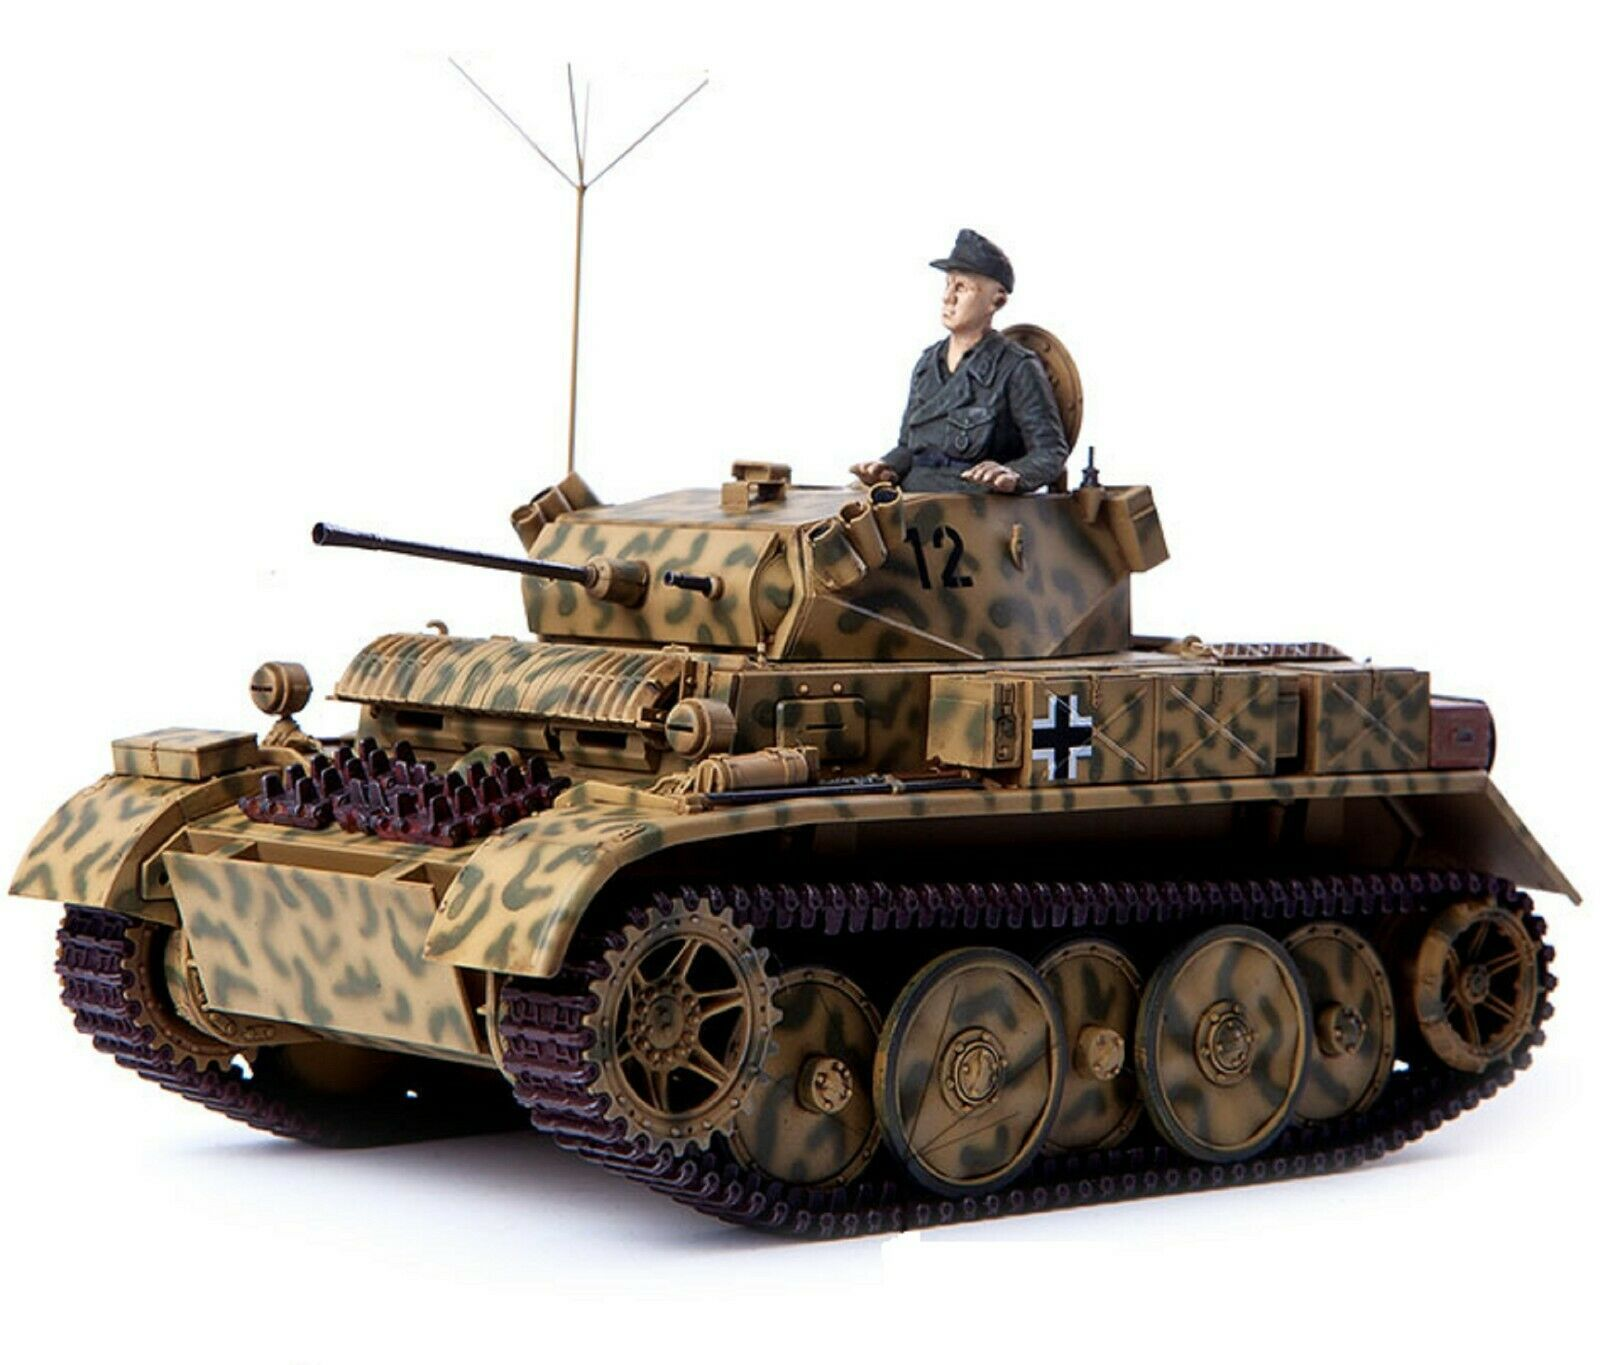 Academy 13526 Pz.Kpfw.II Luchs Ausf.L 1:35 Plamodel